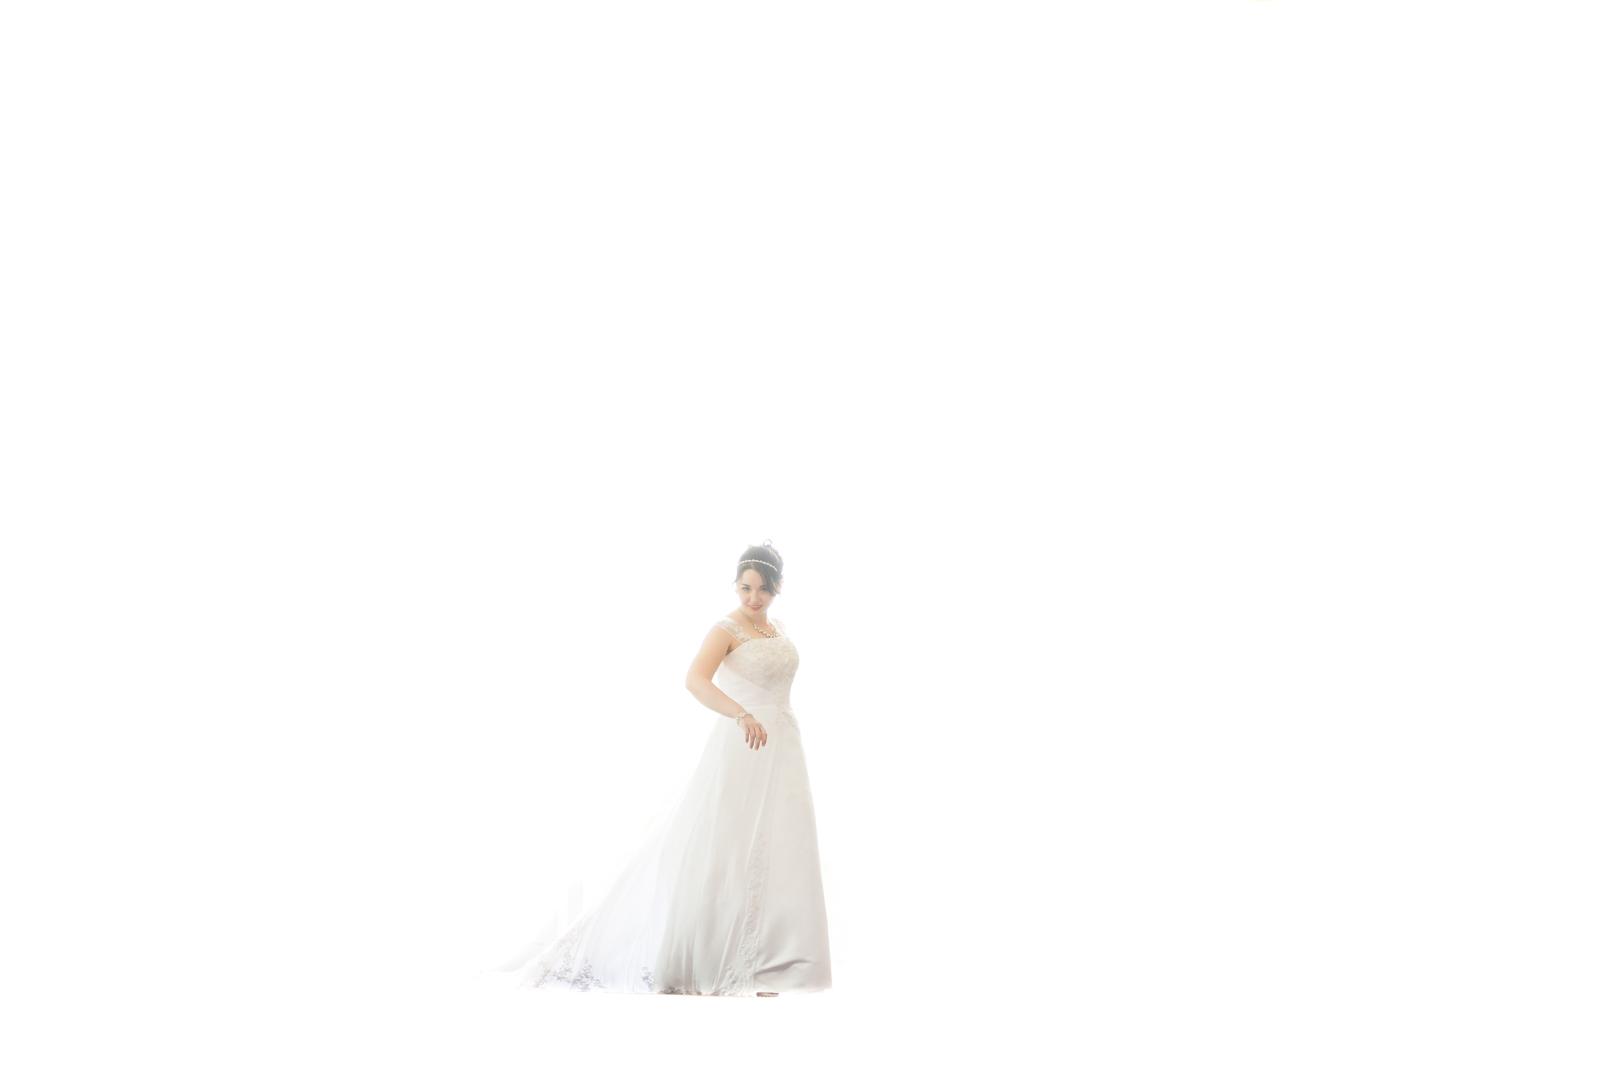 naperville-wedding-photography-42.jpg